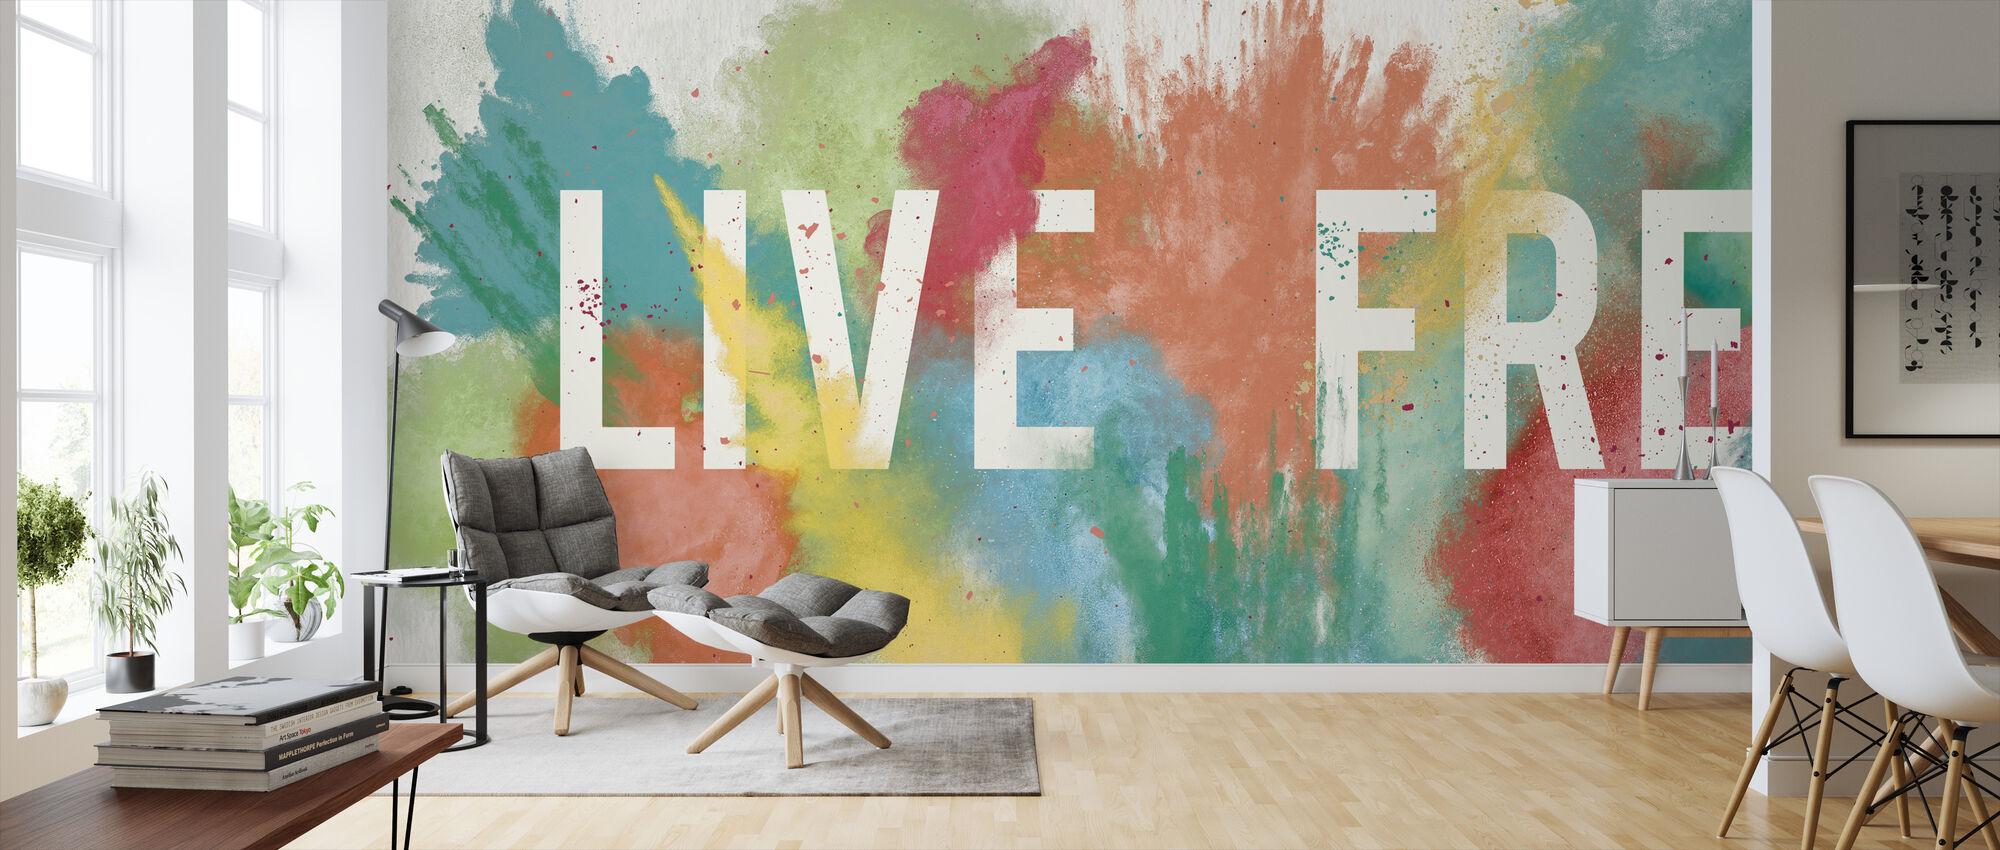 Live Free - Wallpaper - Living Room